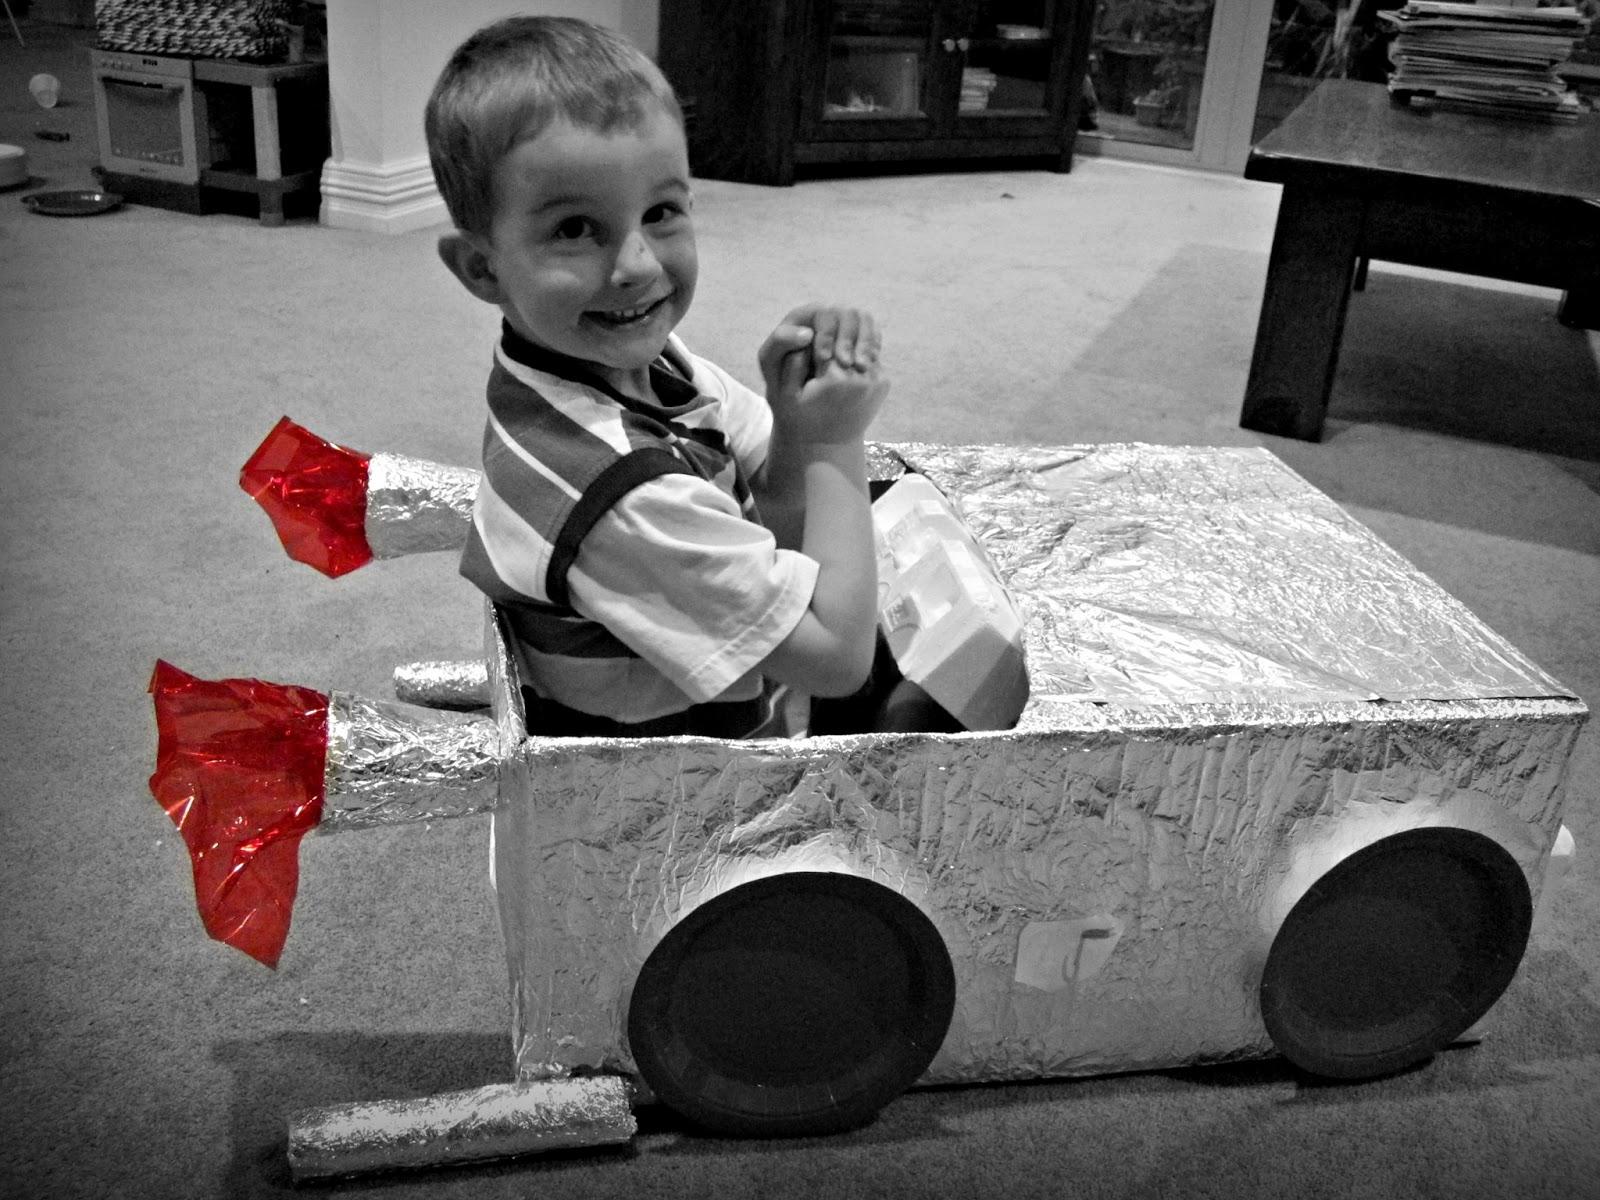 How To: Make A Cardboard Box Car